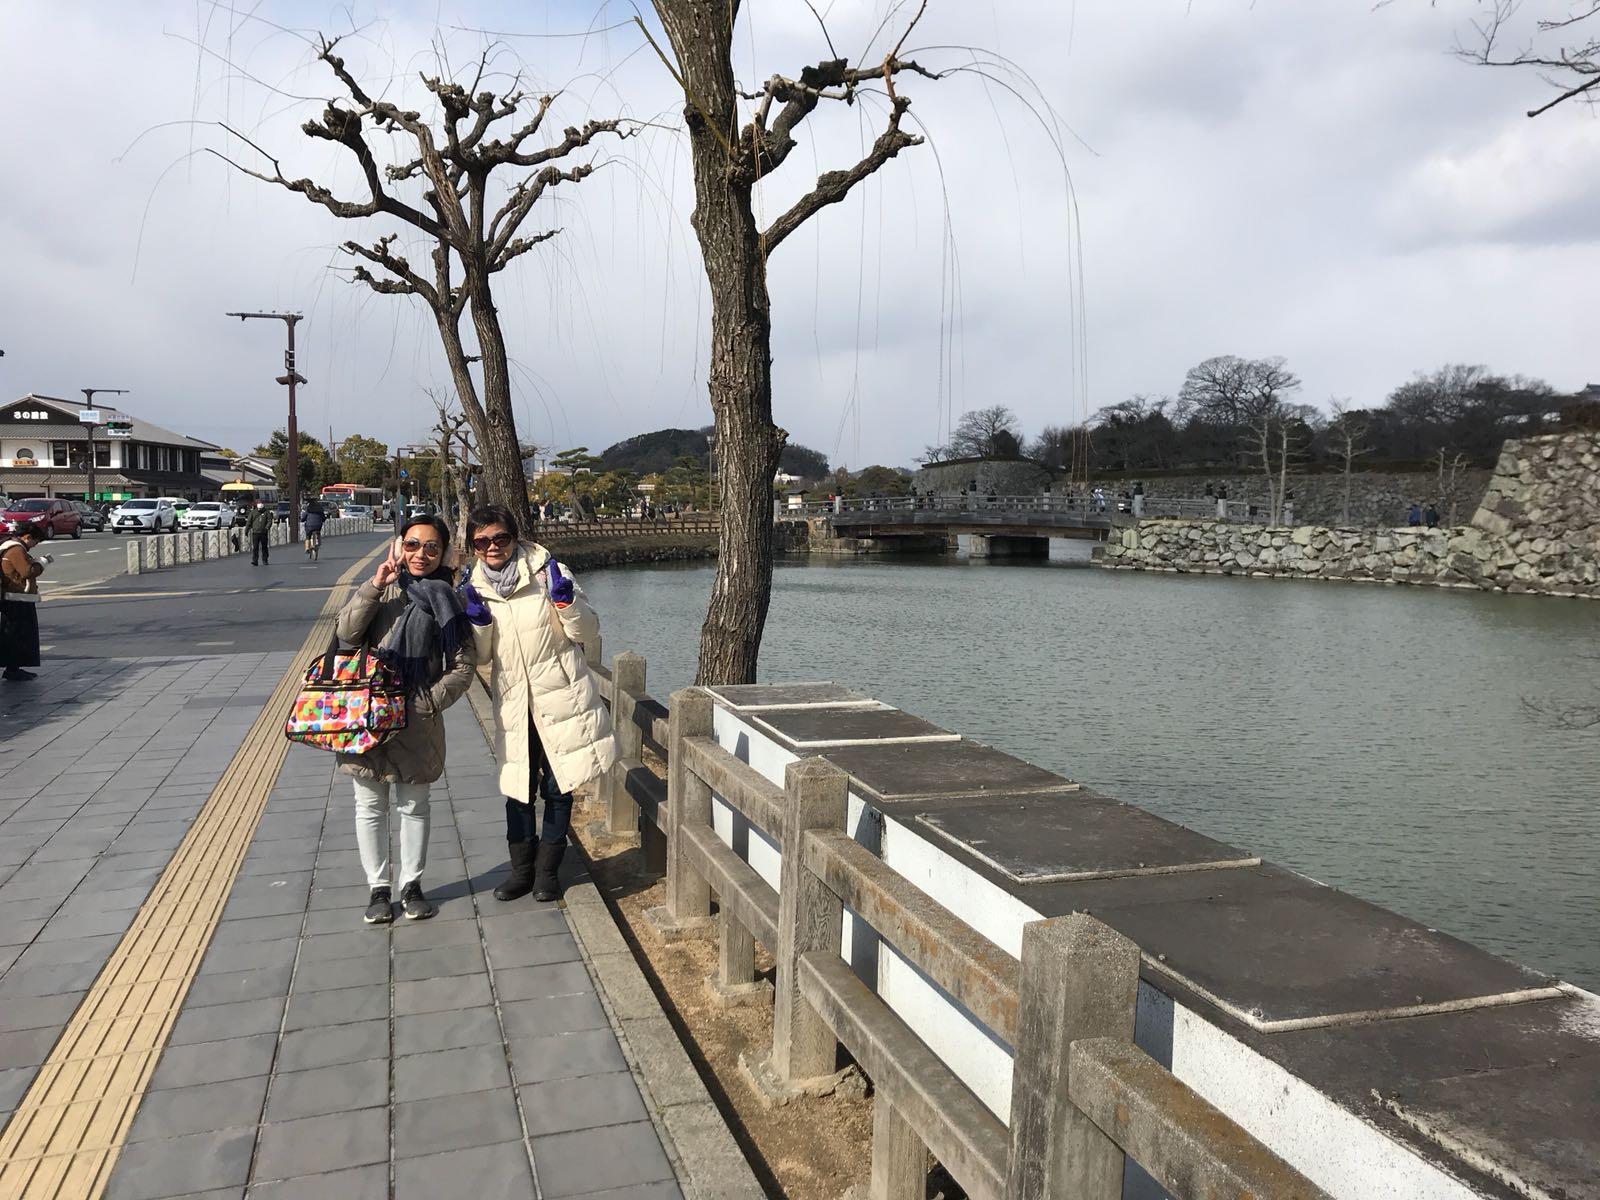 2018-02-20-PHOTO-00000850.jpg